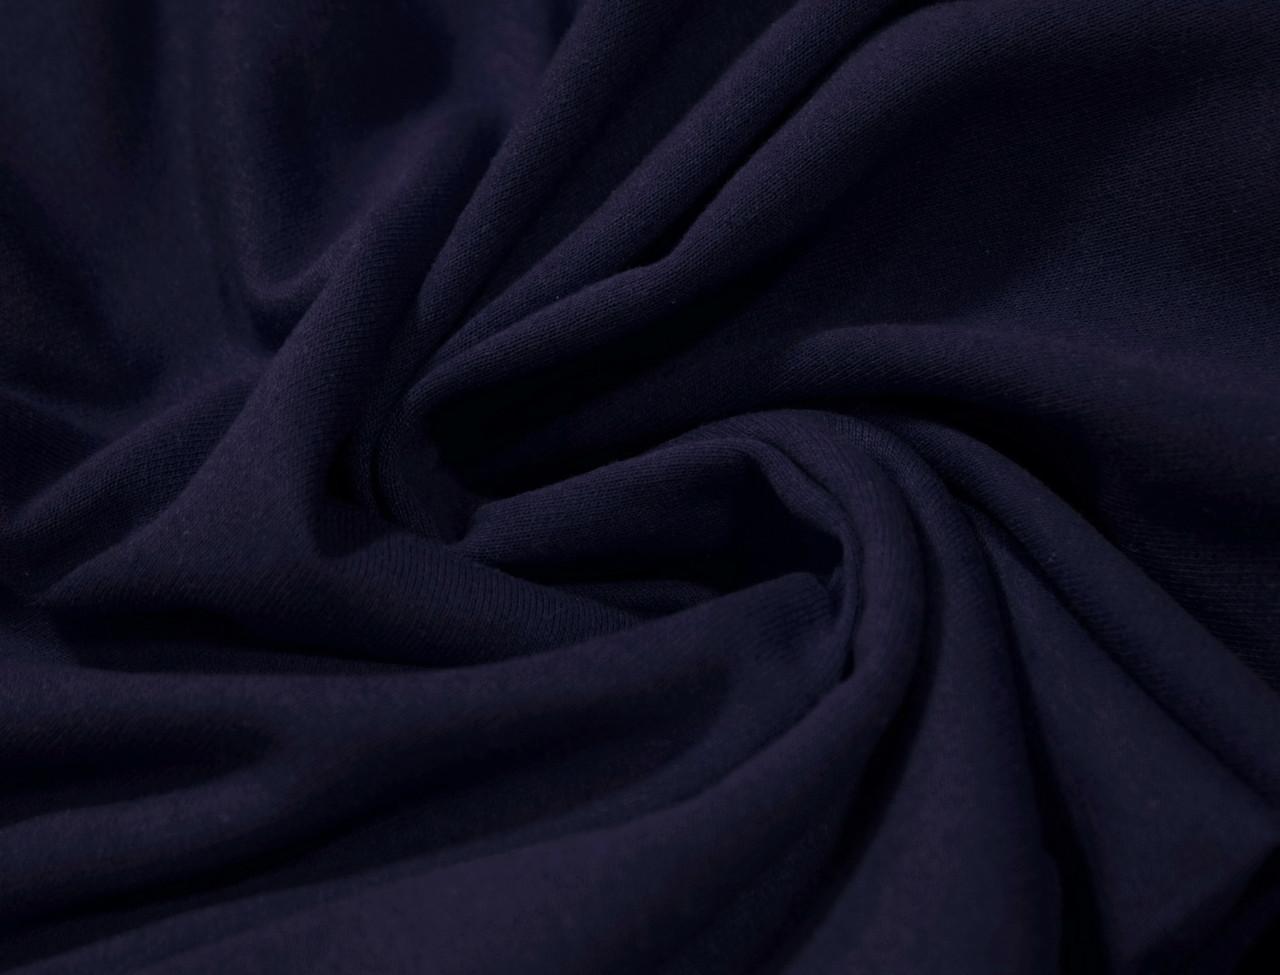 Футер двунитка с начесом темно- синяя (220см, Турция)